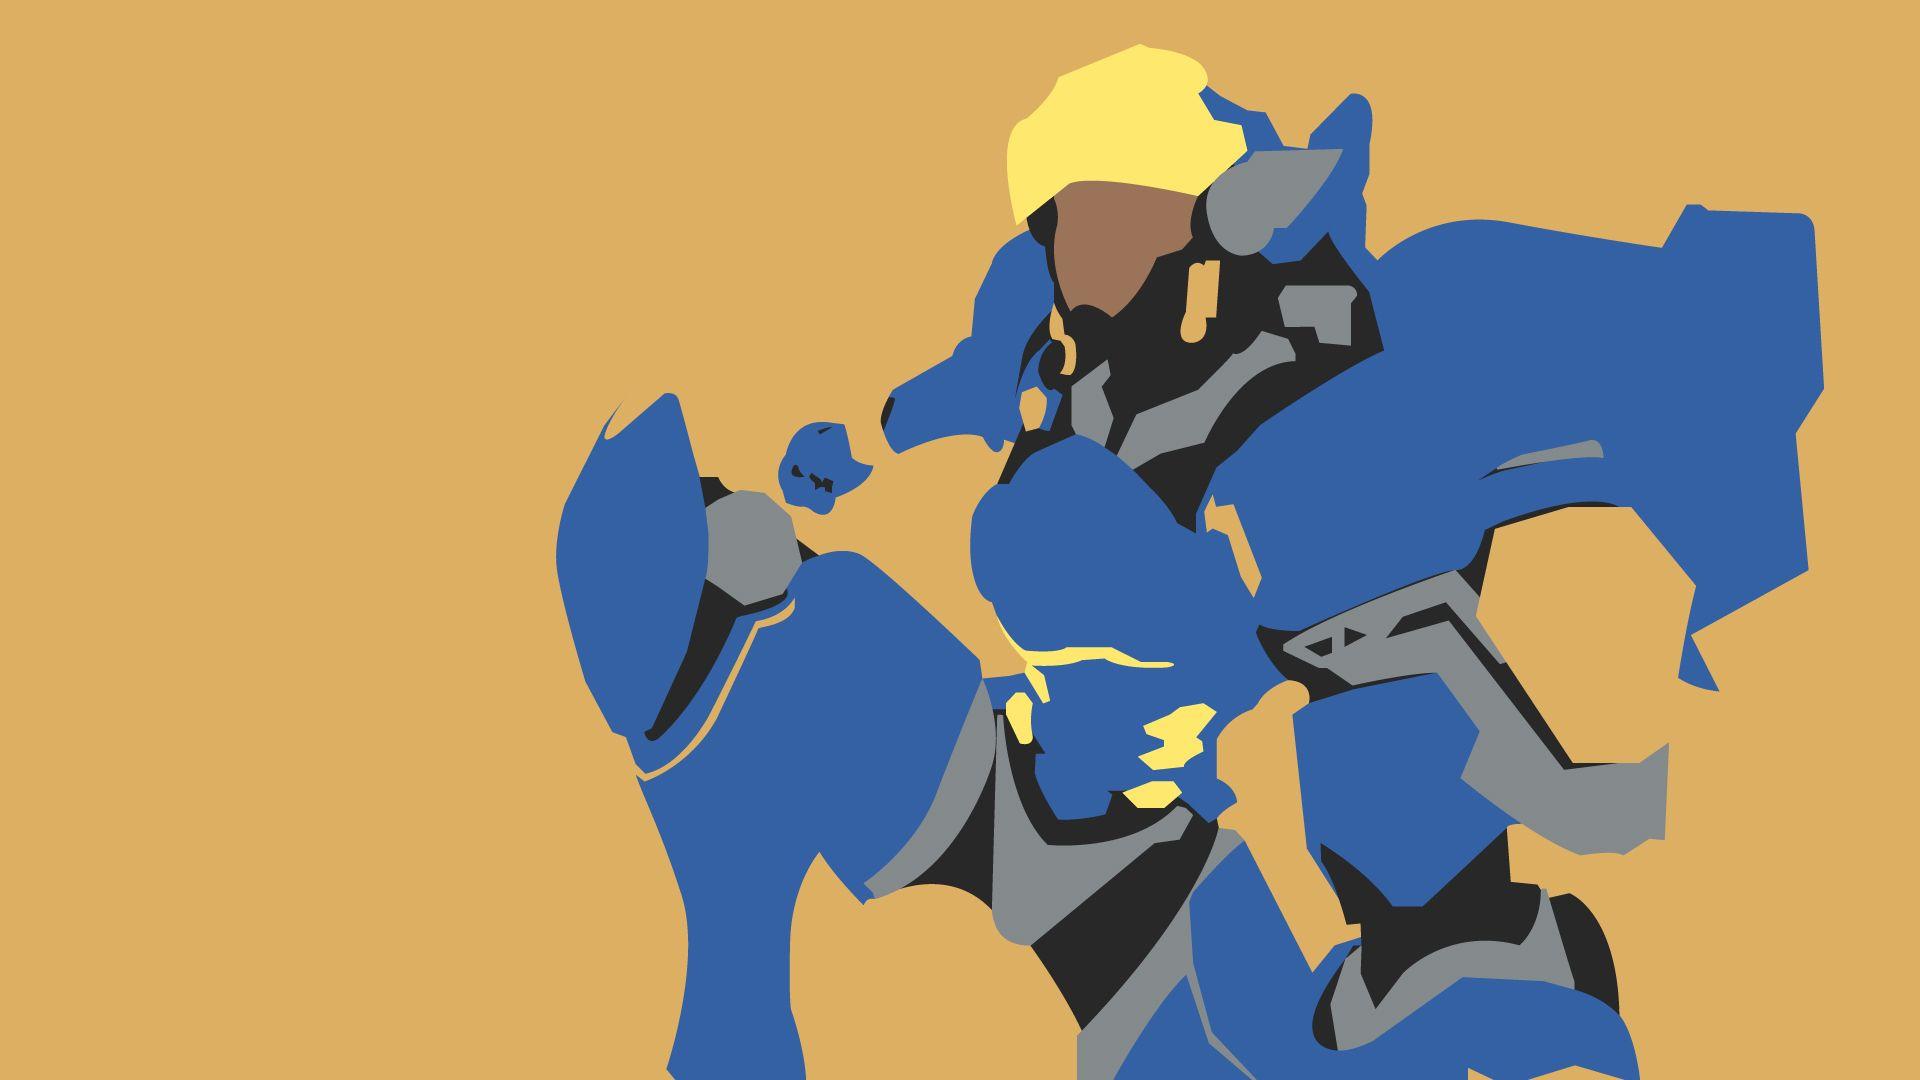 Pharah Overwatch Armor Wallpapers HD Desktop and Mobile ...